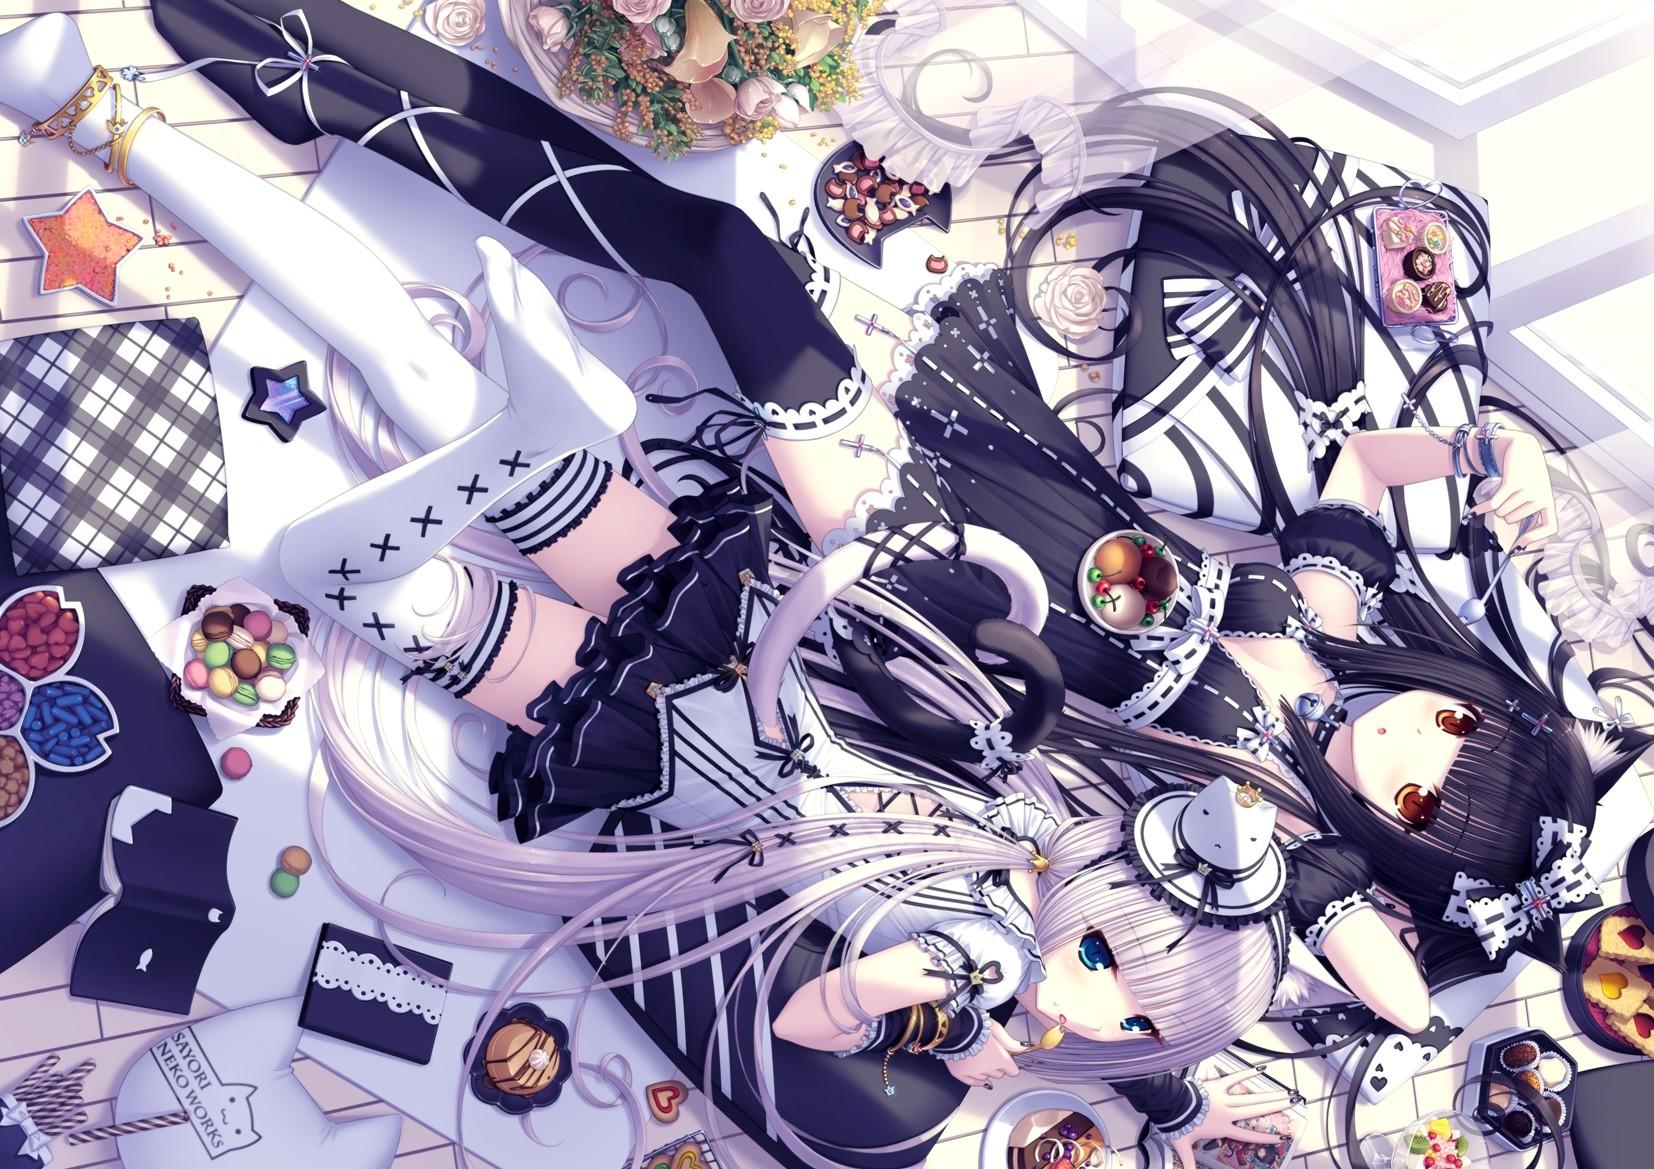 2girls animal_ears bell black_hair blue_eyes book bow candy catgirl chocola_(sayori) collar cross flowers food hat heart lolita_fashion long_hair orange_eyes original ribbons rose sayori shade tail thighhighs vanilla_(sayori) white_hair zettai_ryouiki